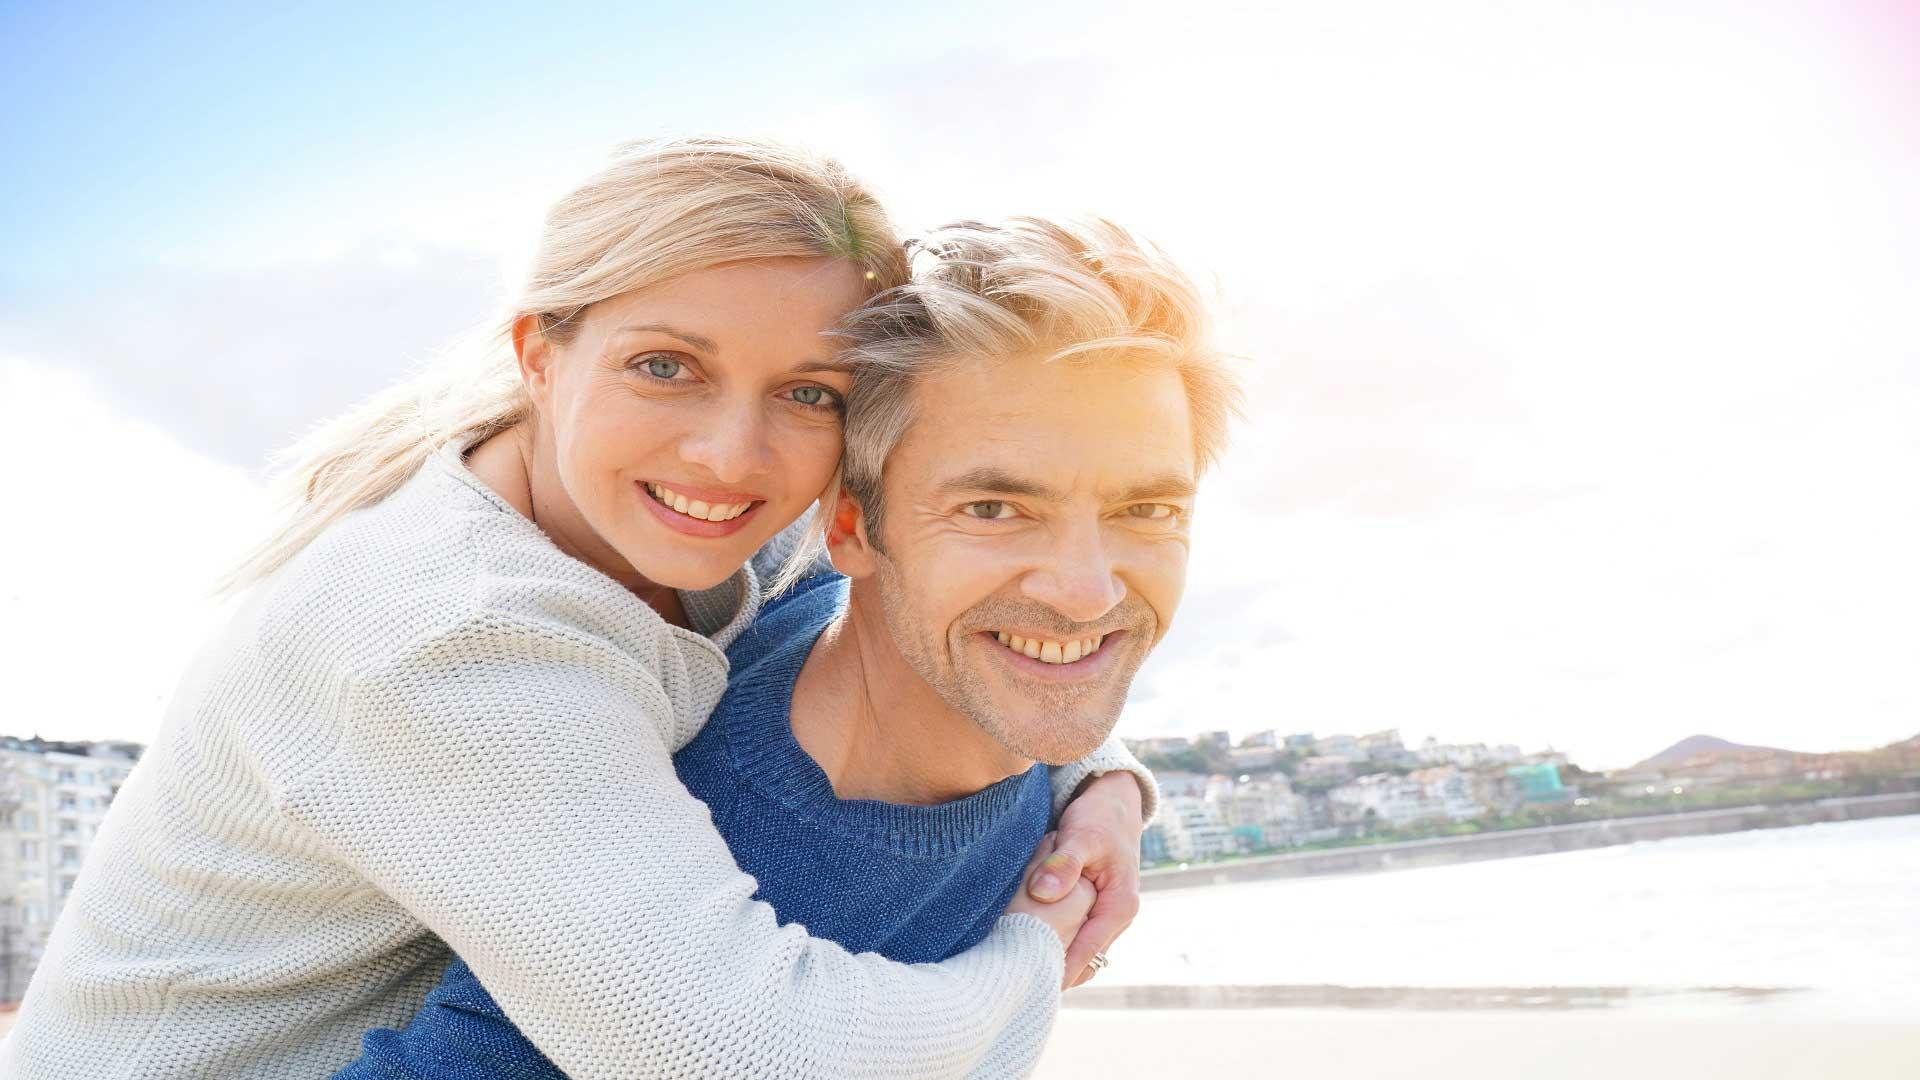 Dating App Bi Dating Sivustot Suuri Ja Kaunis Onlinedating Tranny Luokiteltu Paras.